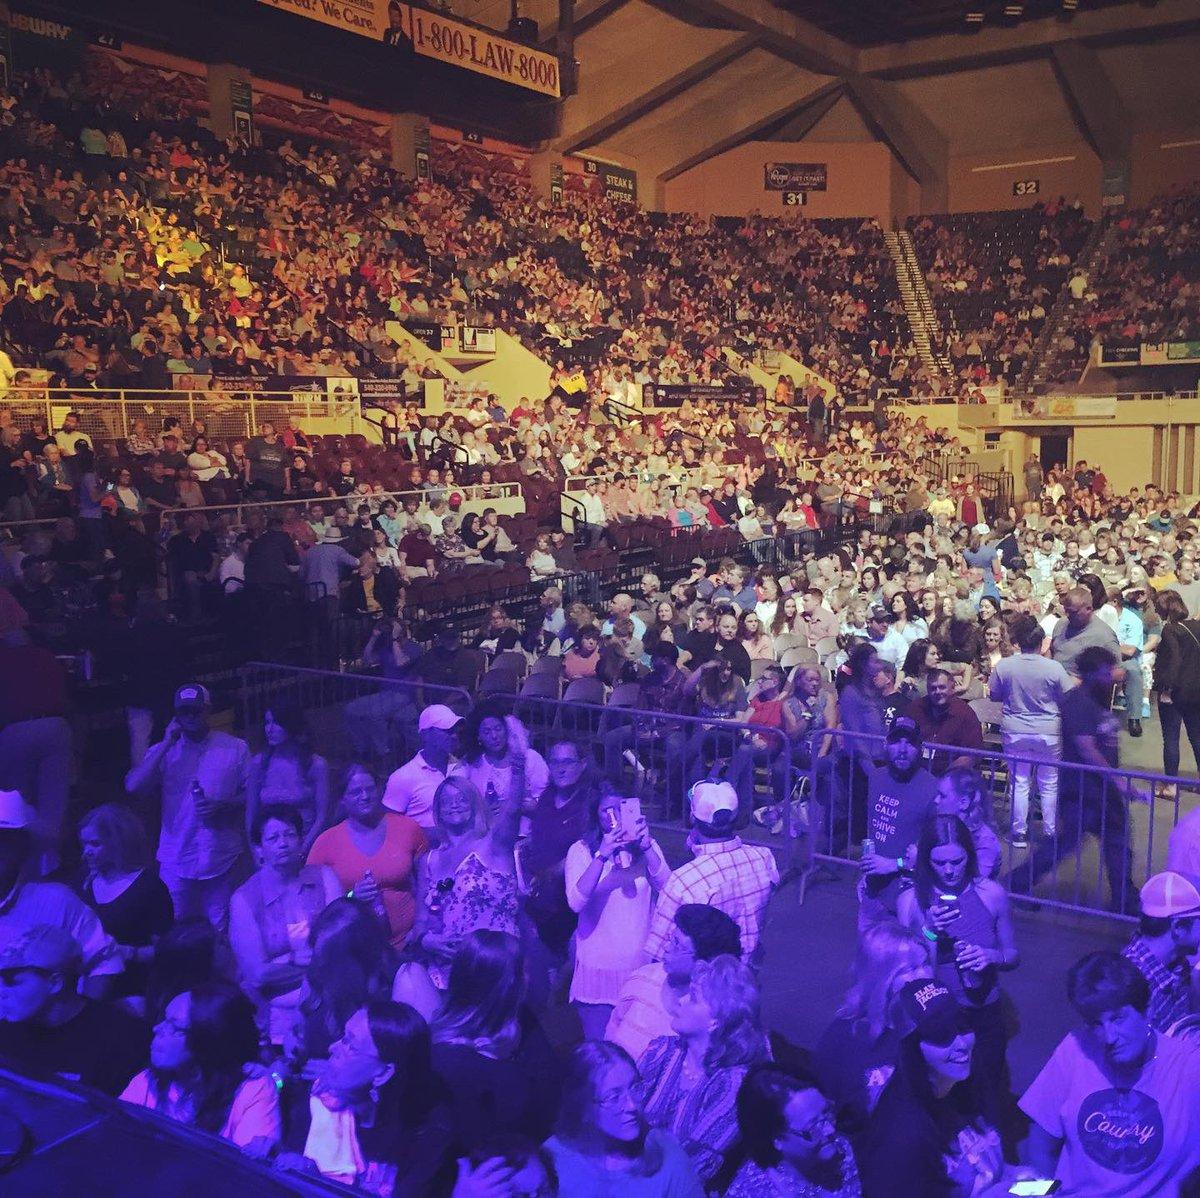 Audience shot before the Alan Jackson Show started in Roanoke, VA!!! #OpeningAct #AlanJackson #AlanJacksonTour pic.twitter.com/mCjrfp9SPk